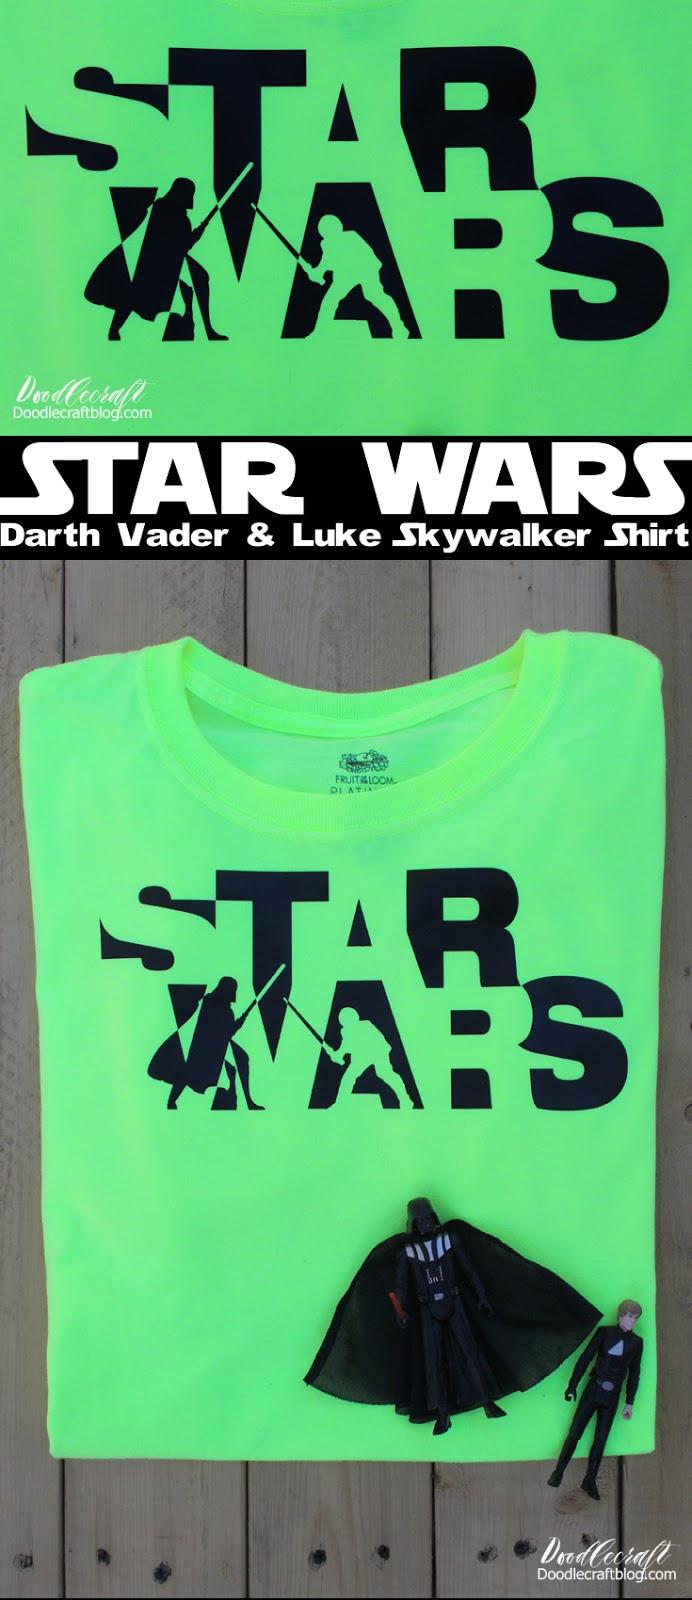 Star Wars Darth Vader-Luke Skywalker Battle Iron-On Vinyl